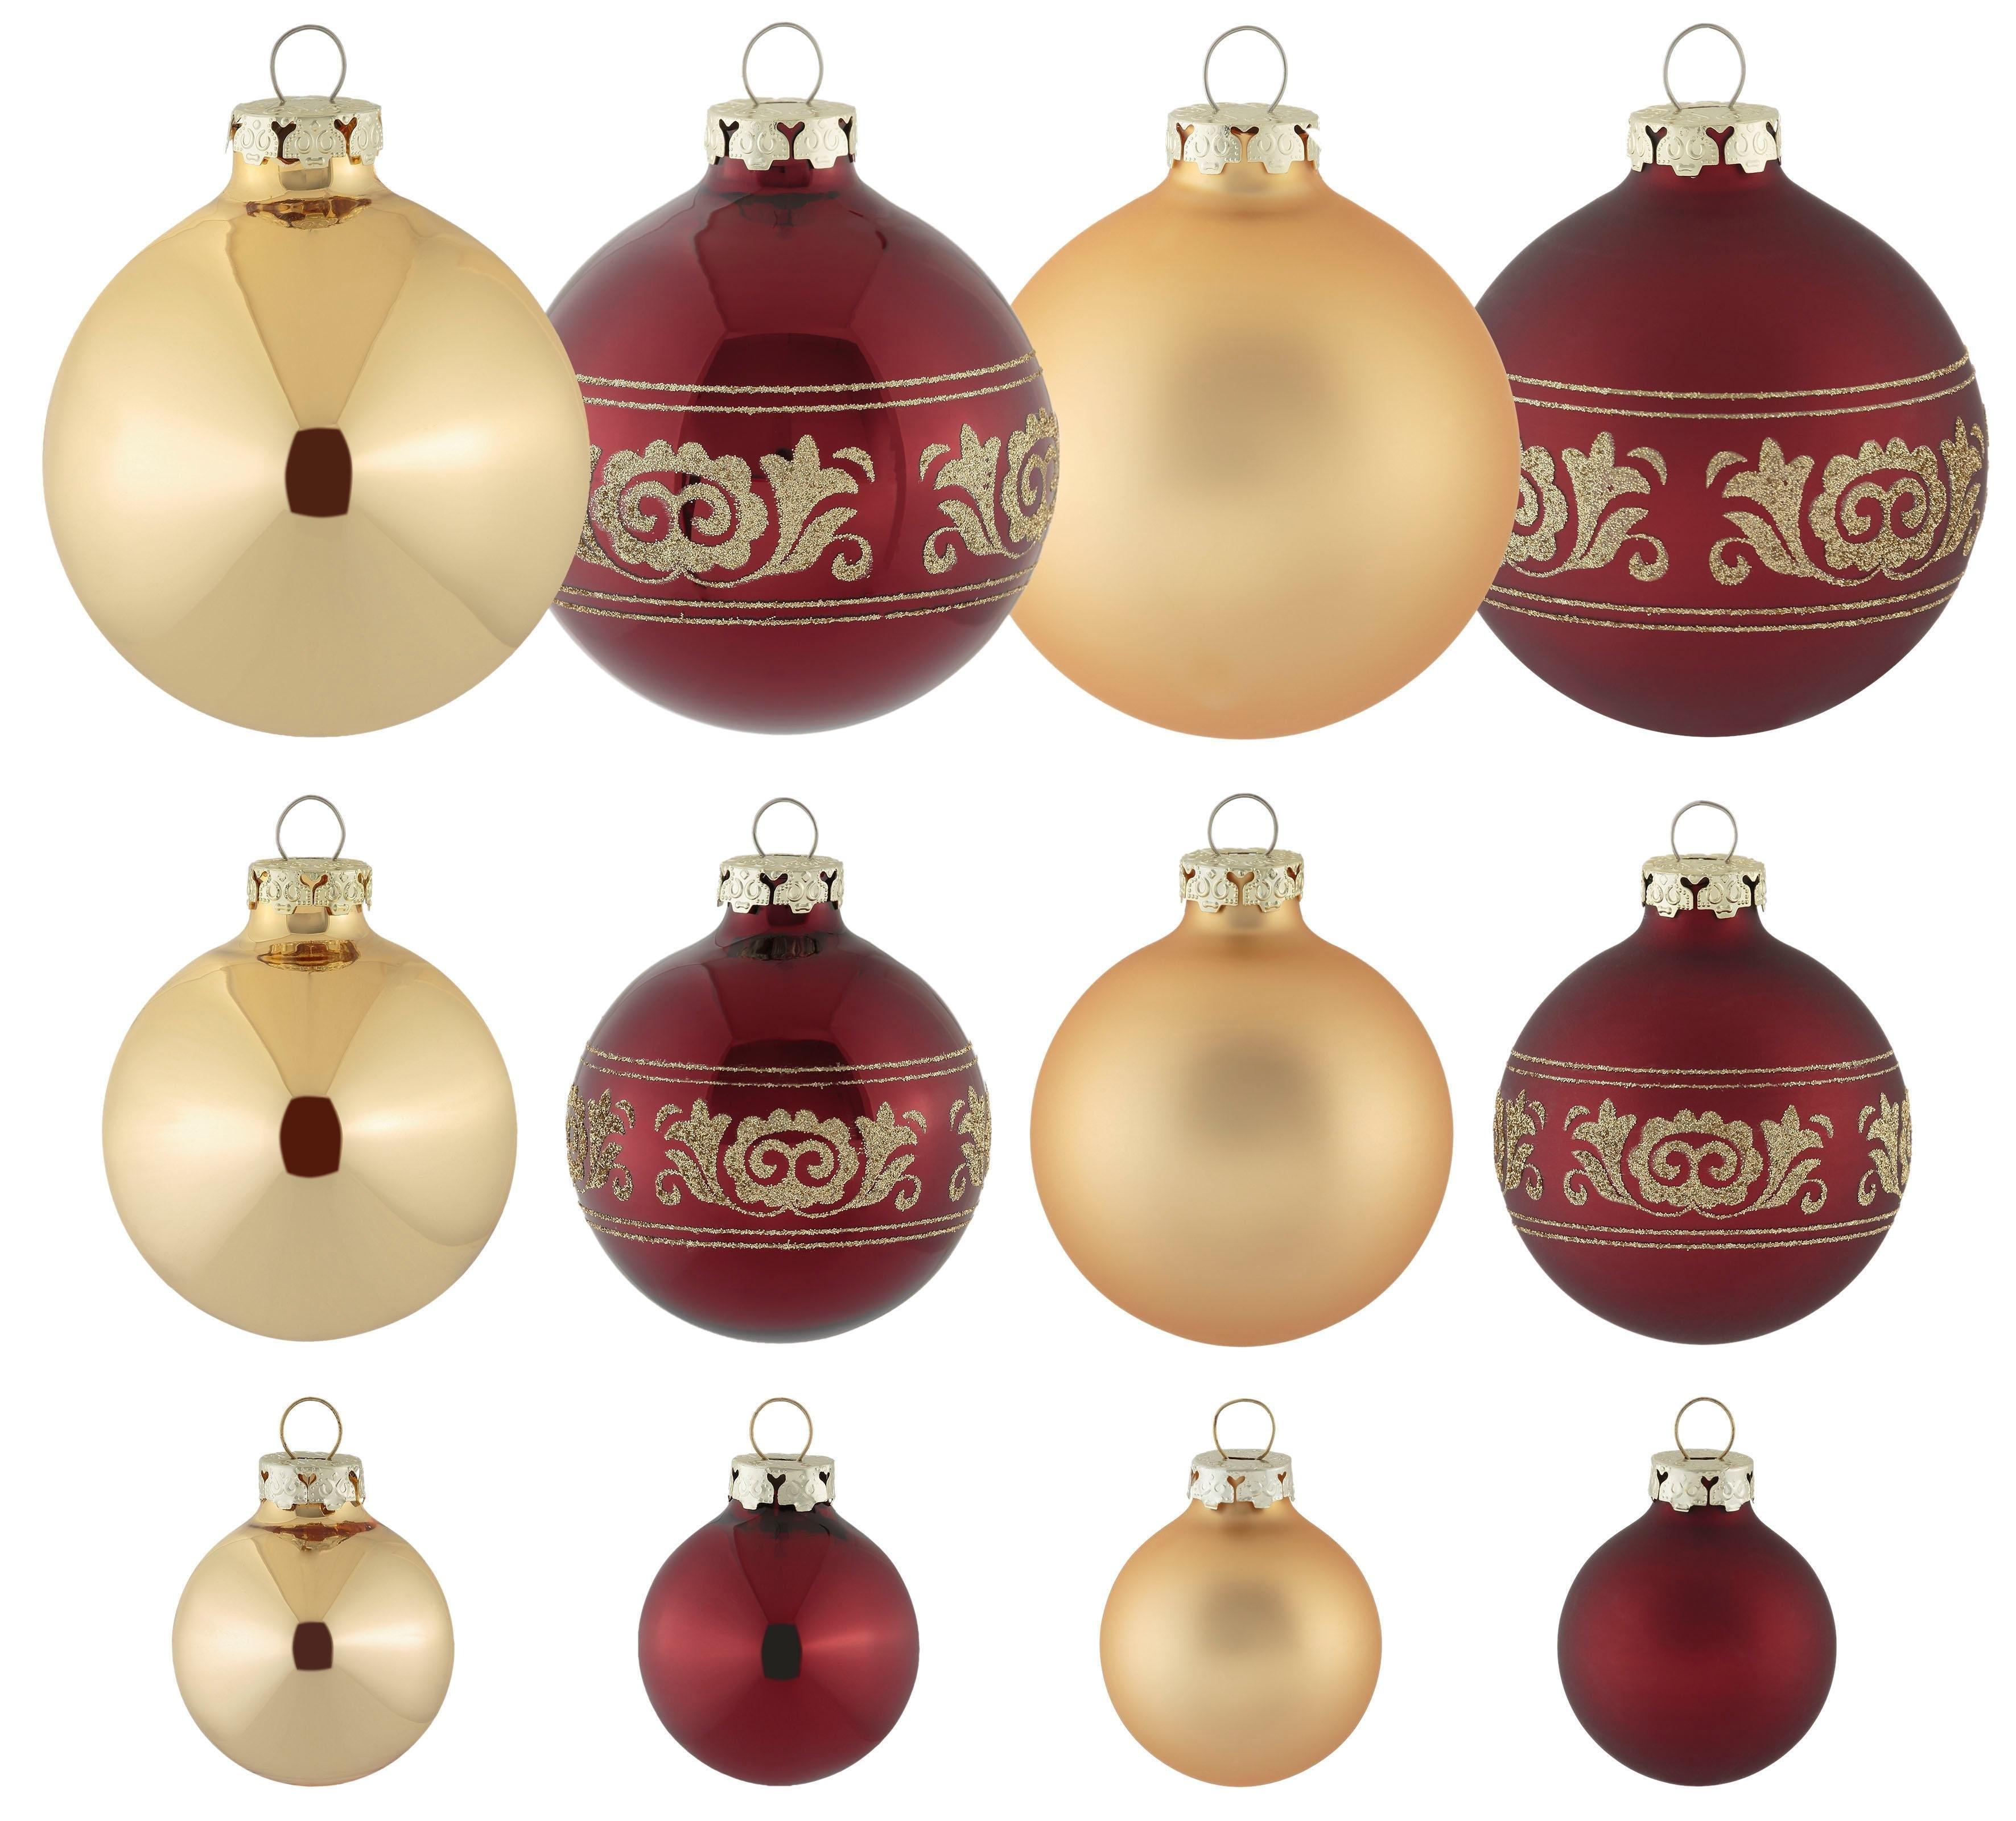 Thüringer Glasdesign kerstbal - verschillende betaalmethodes